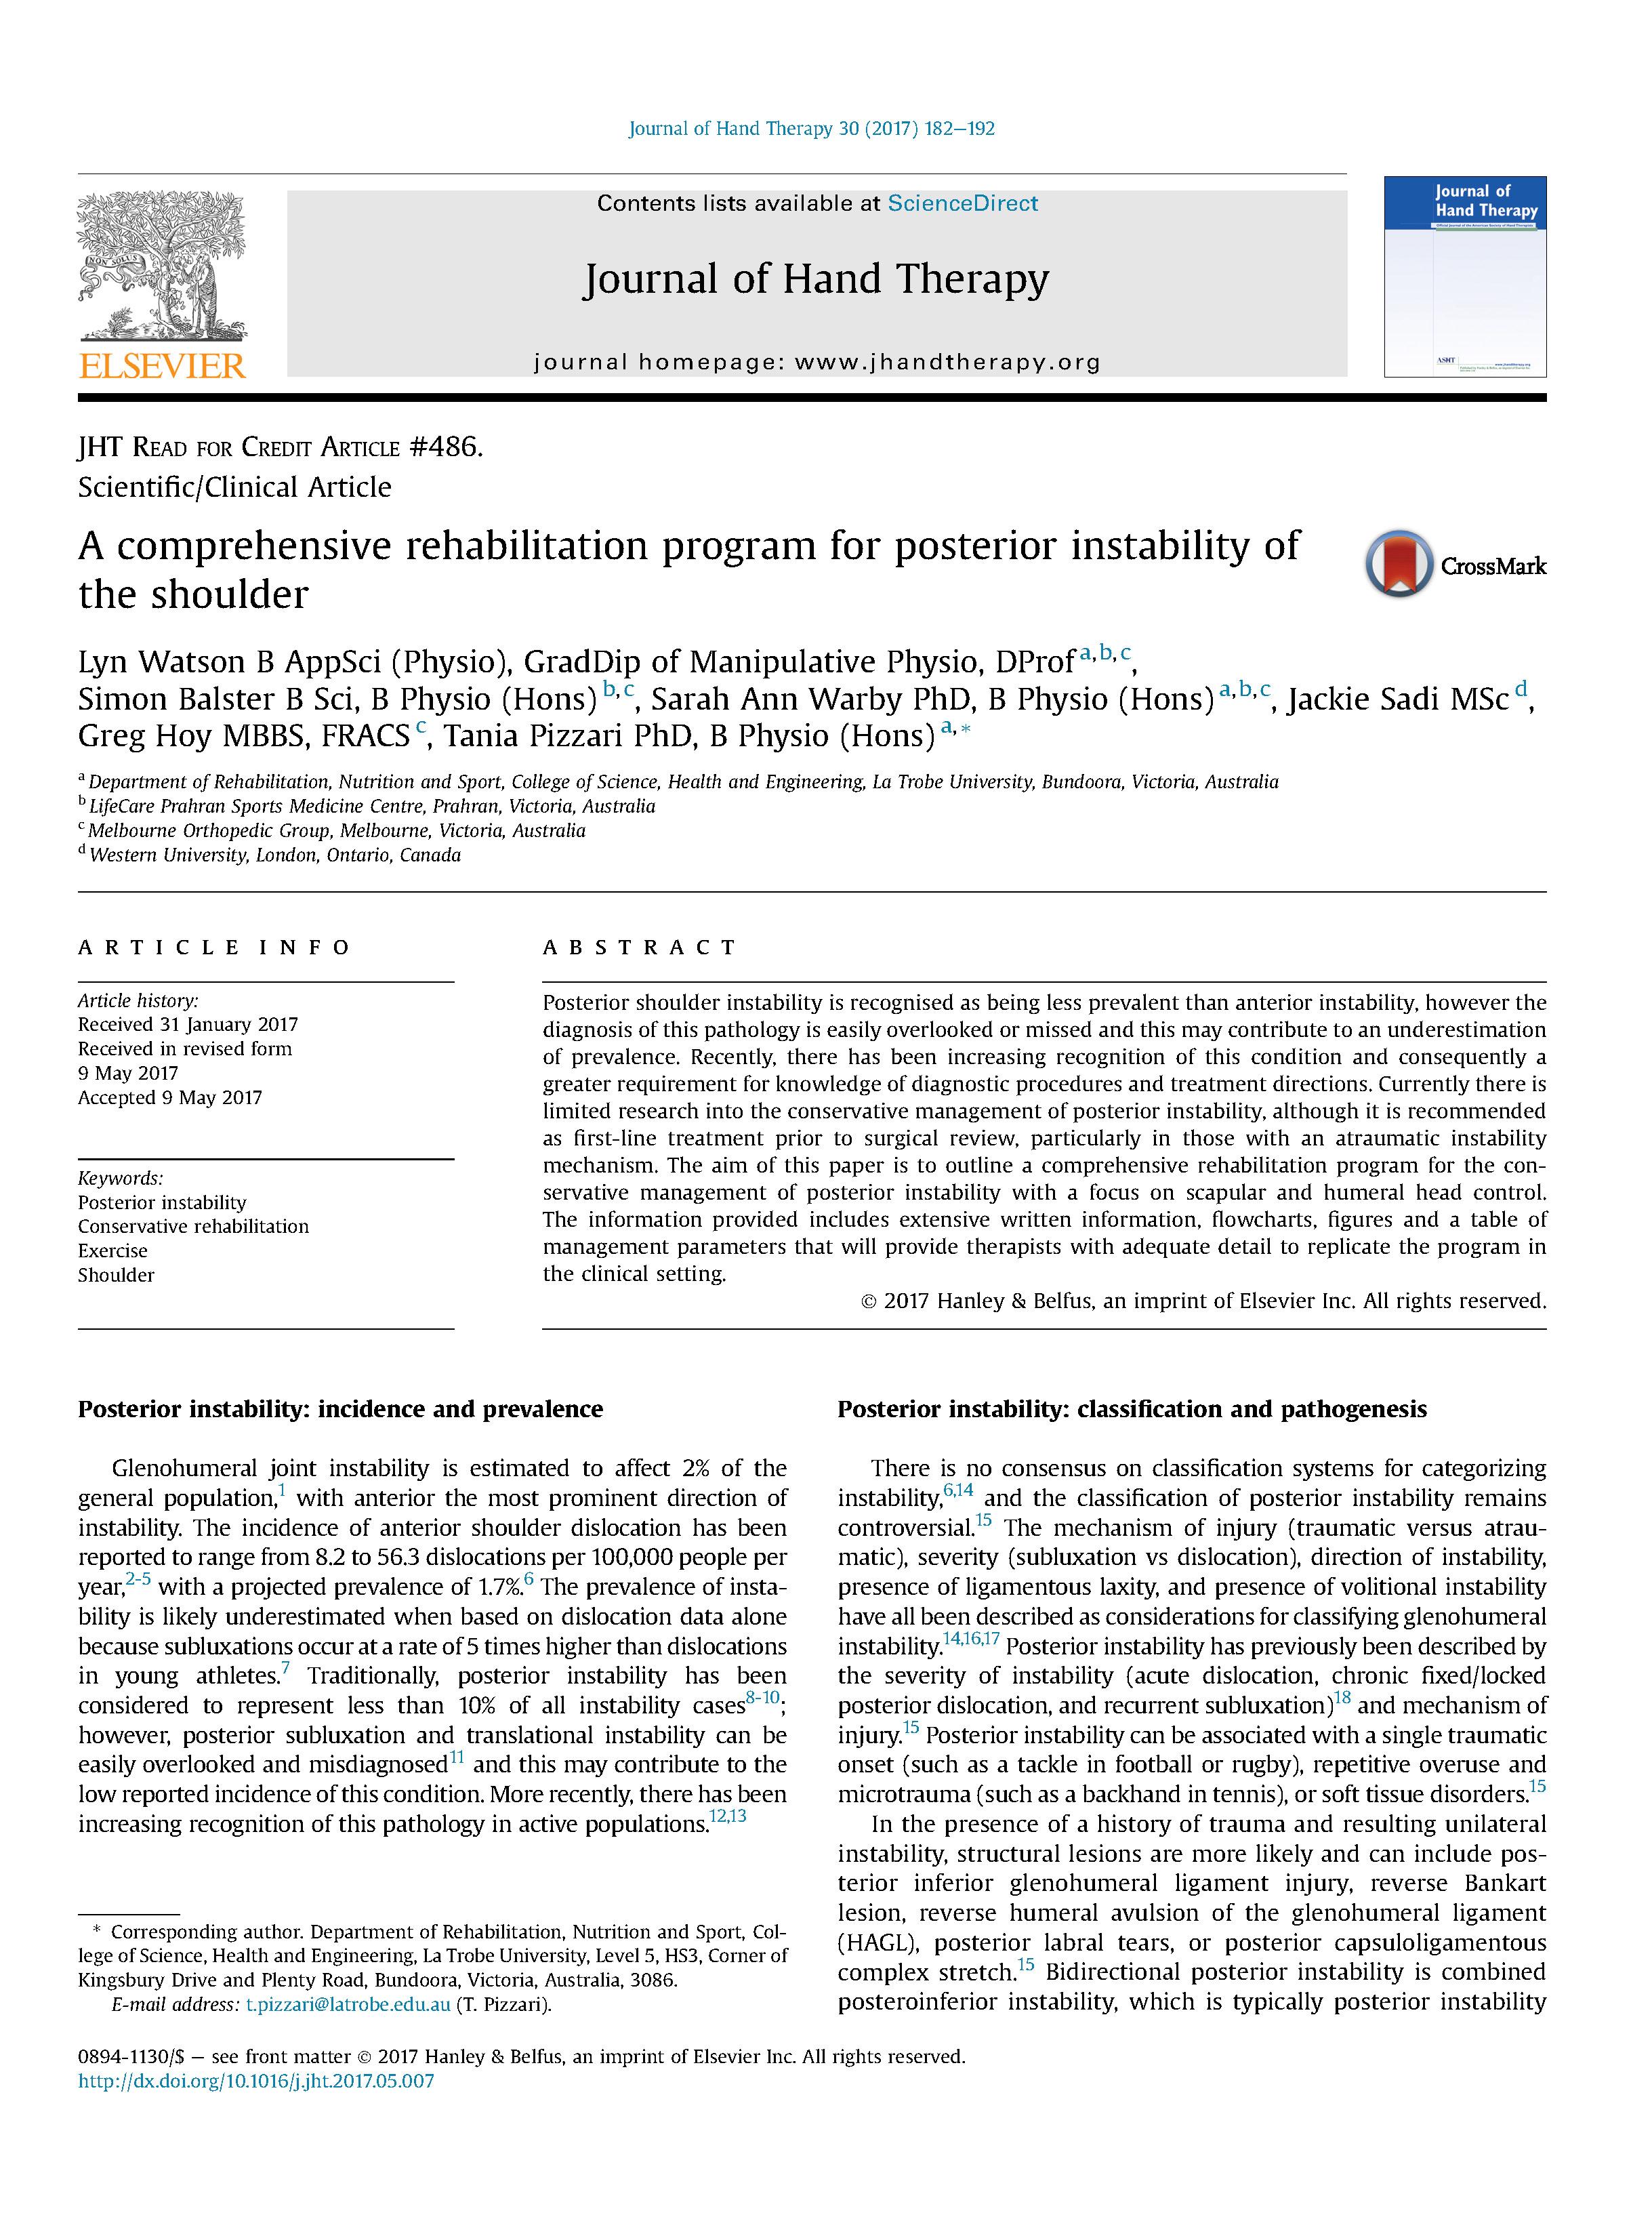 Lyn Watson Post-Instability Rehabilitation Program_Page_04.jpg